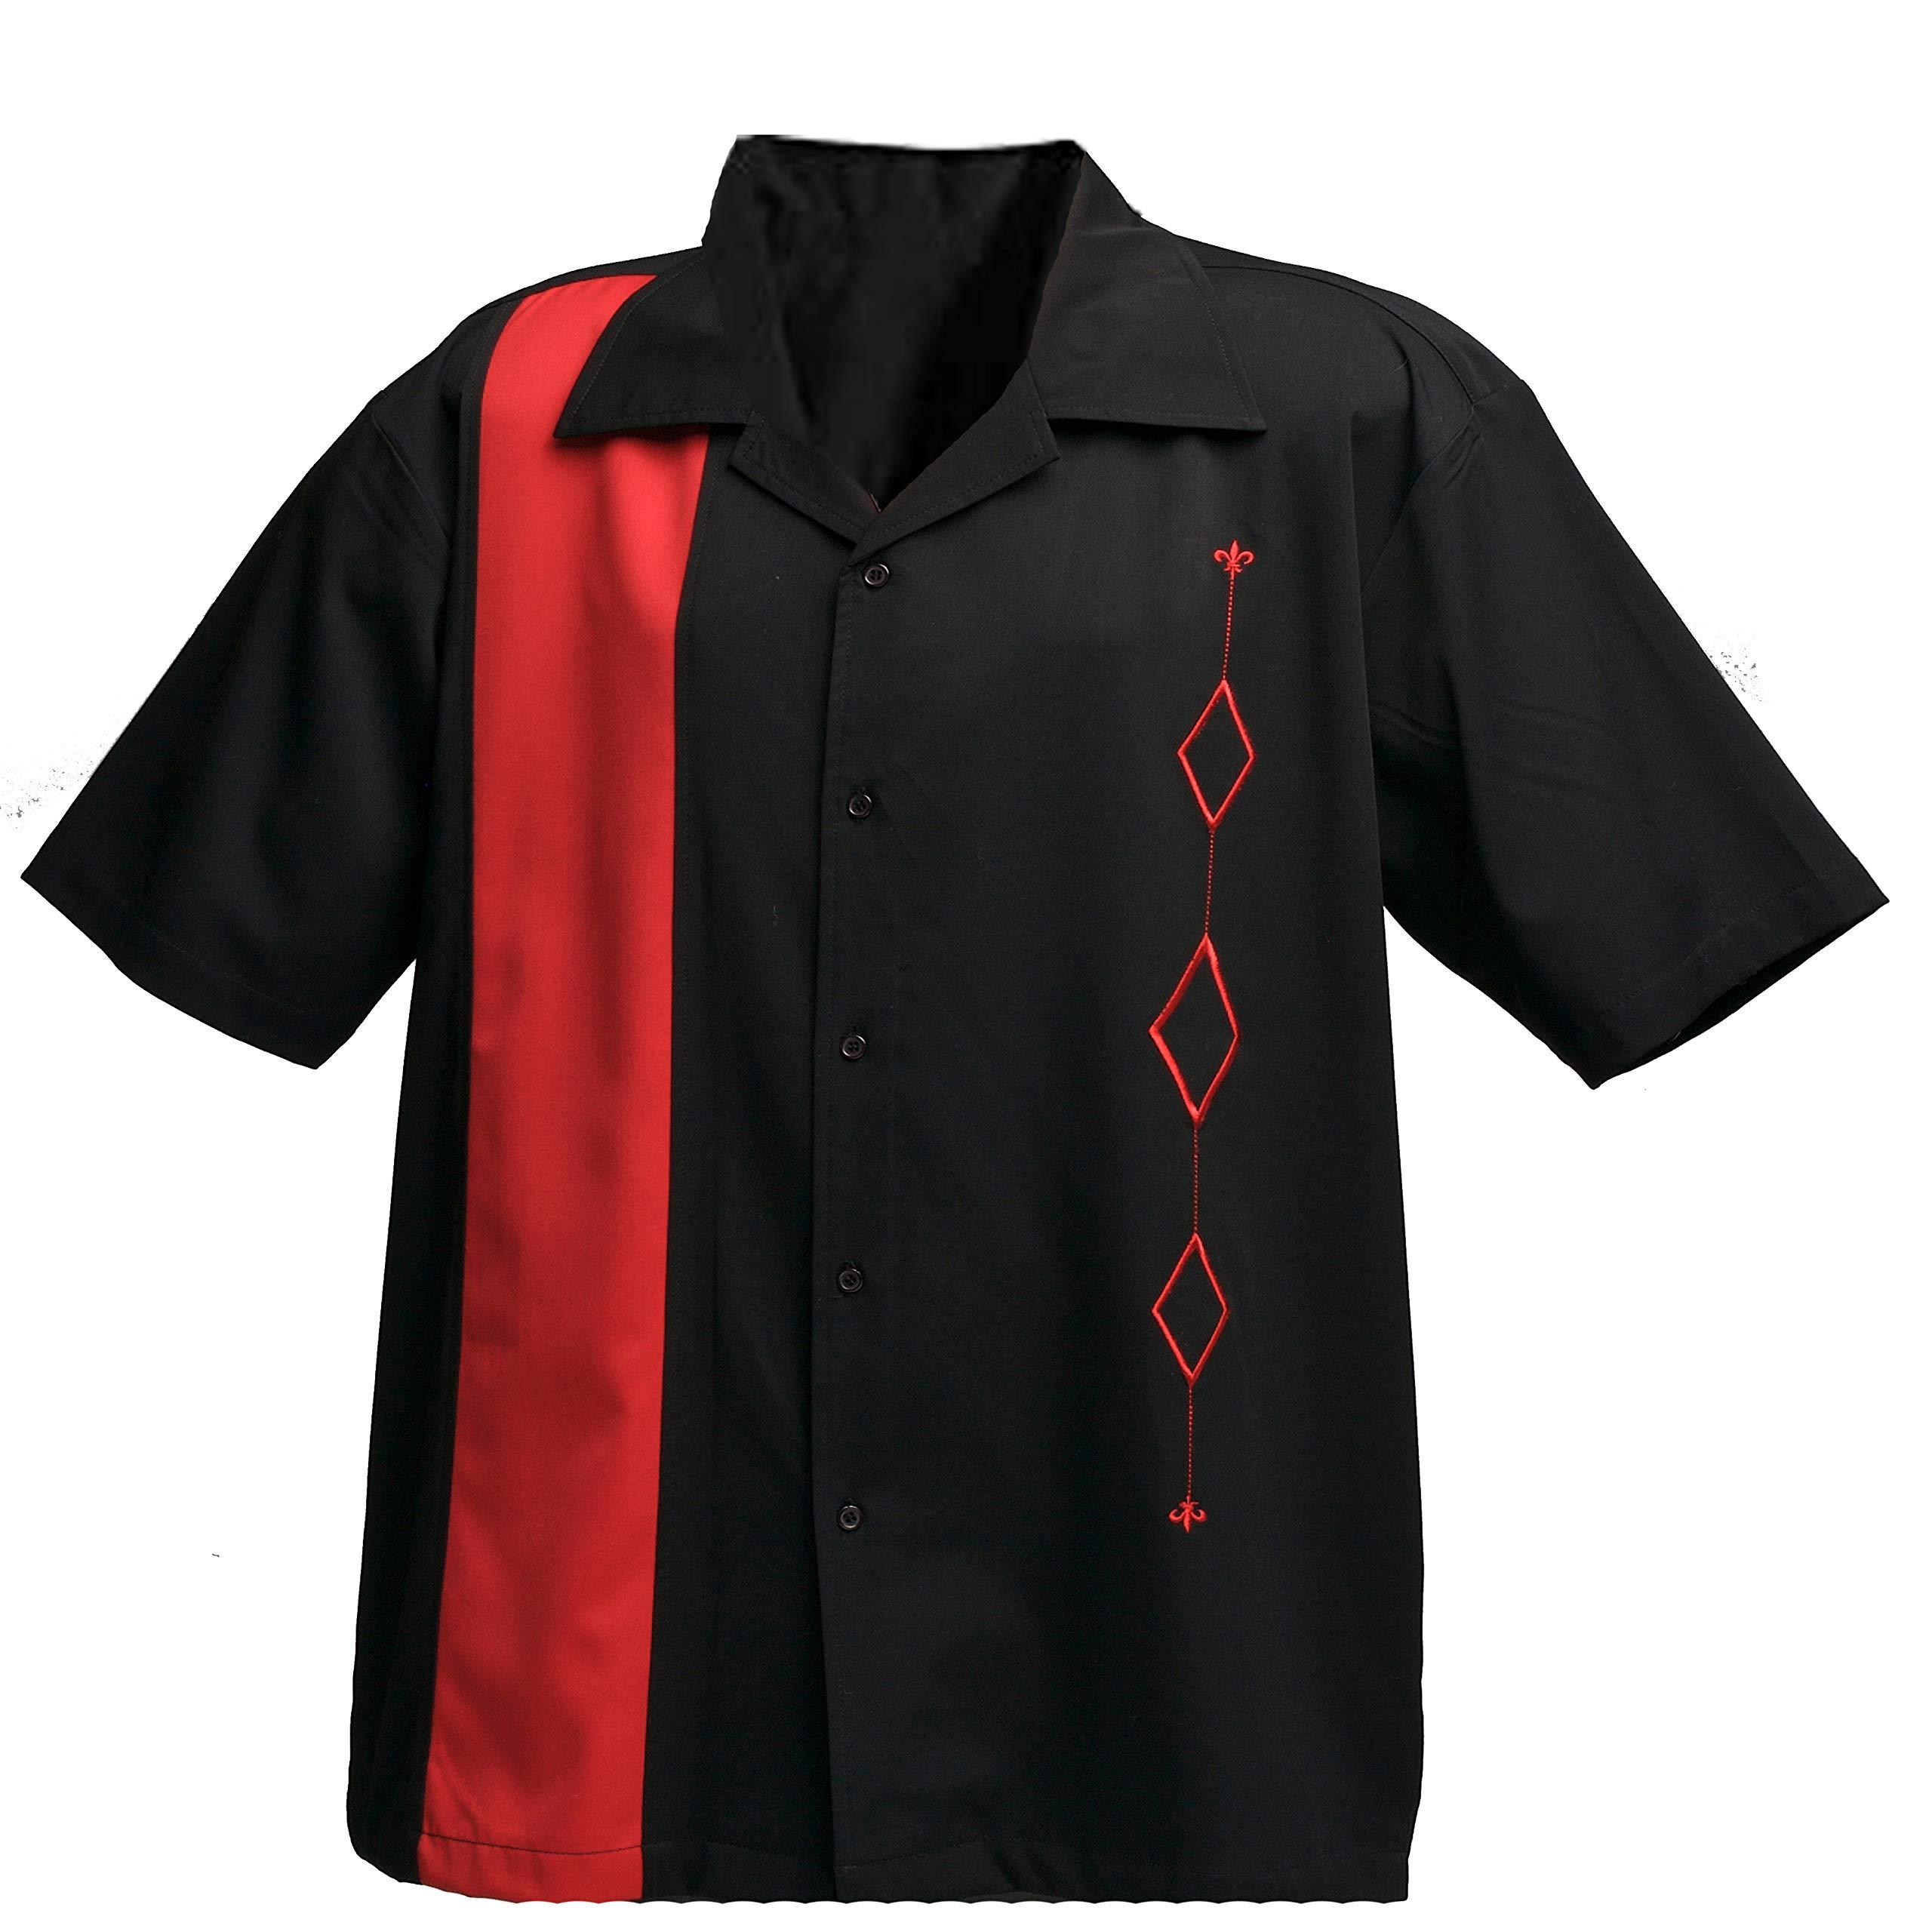 Designs by Attila Mens Retro Bowling Shirt, Red & Black, Size Medium